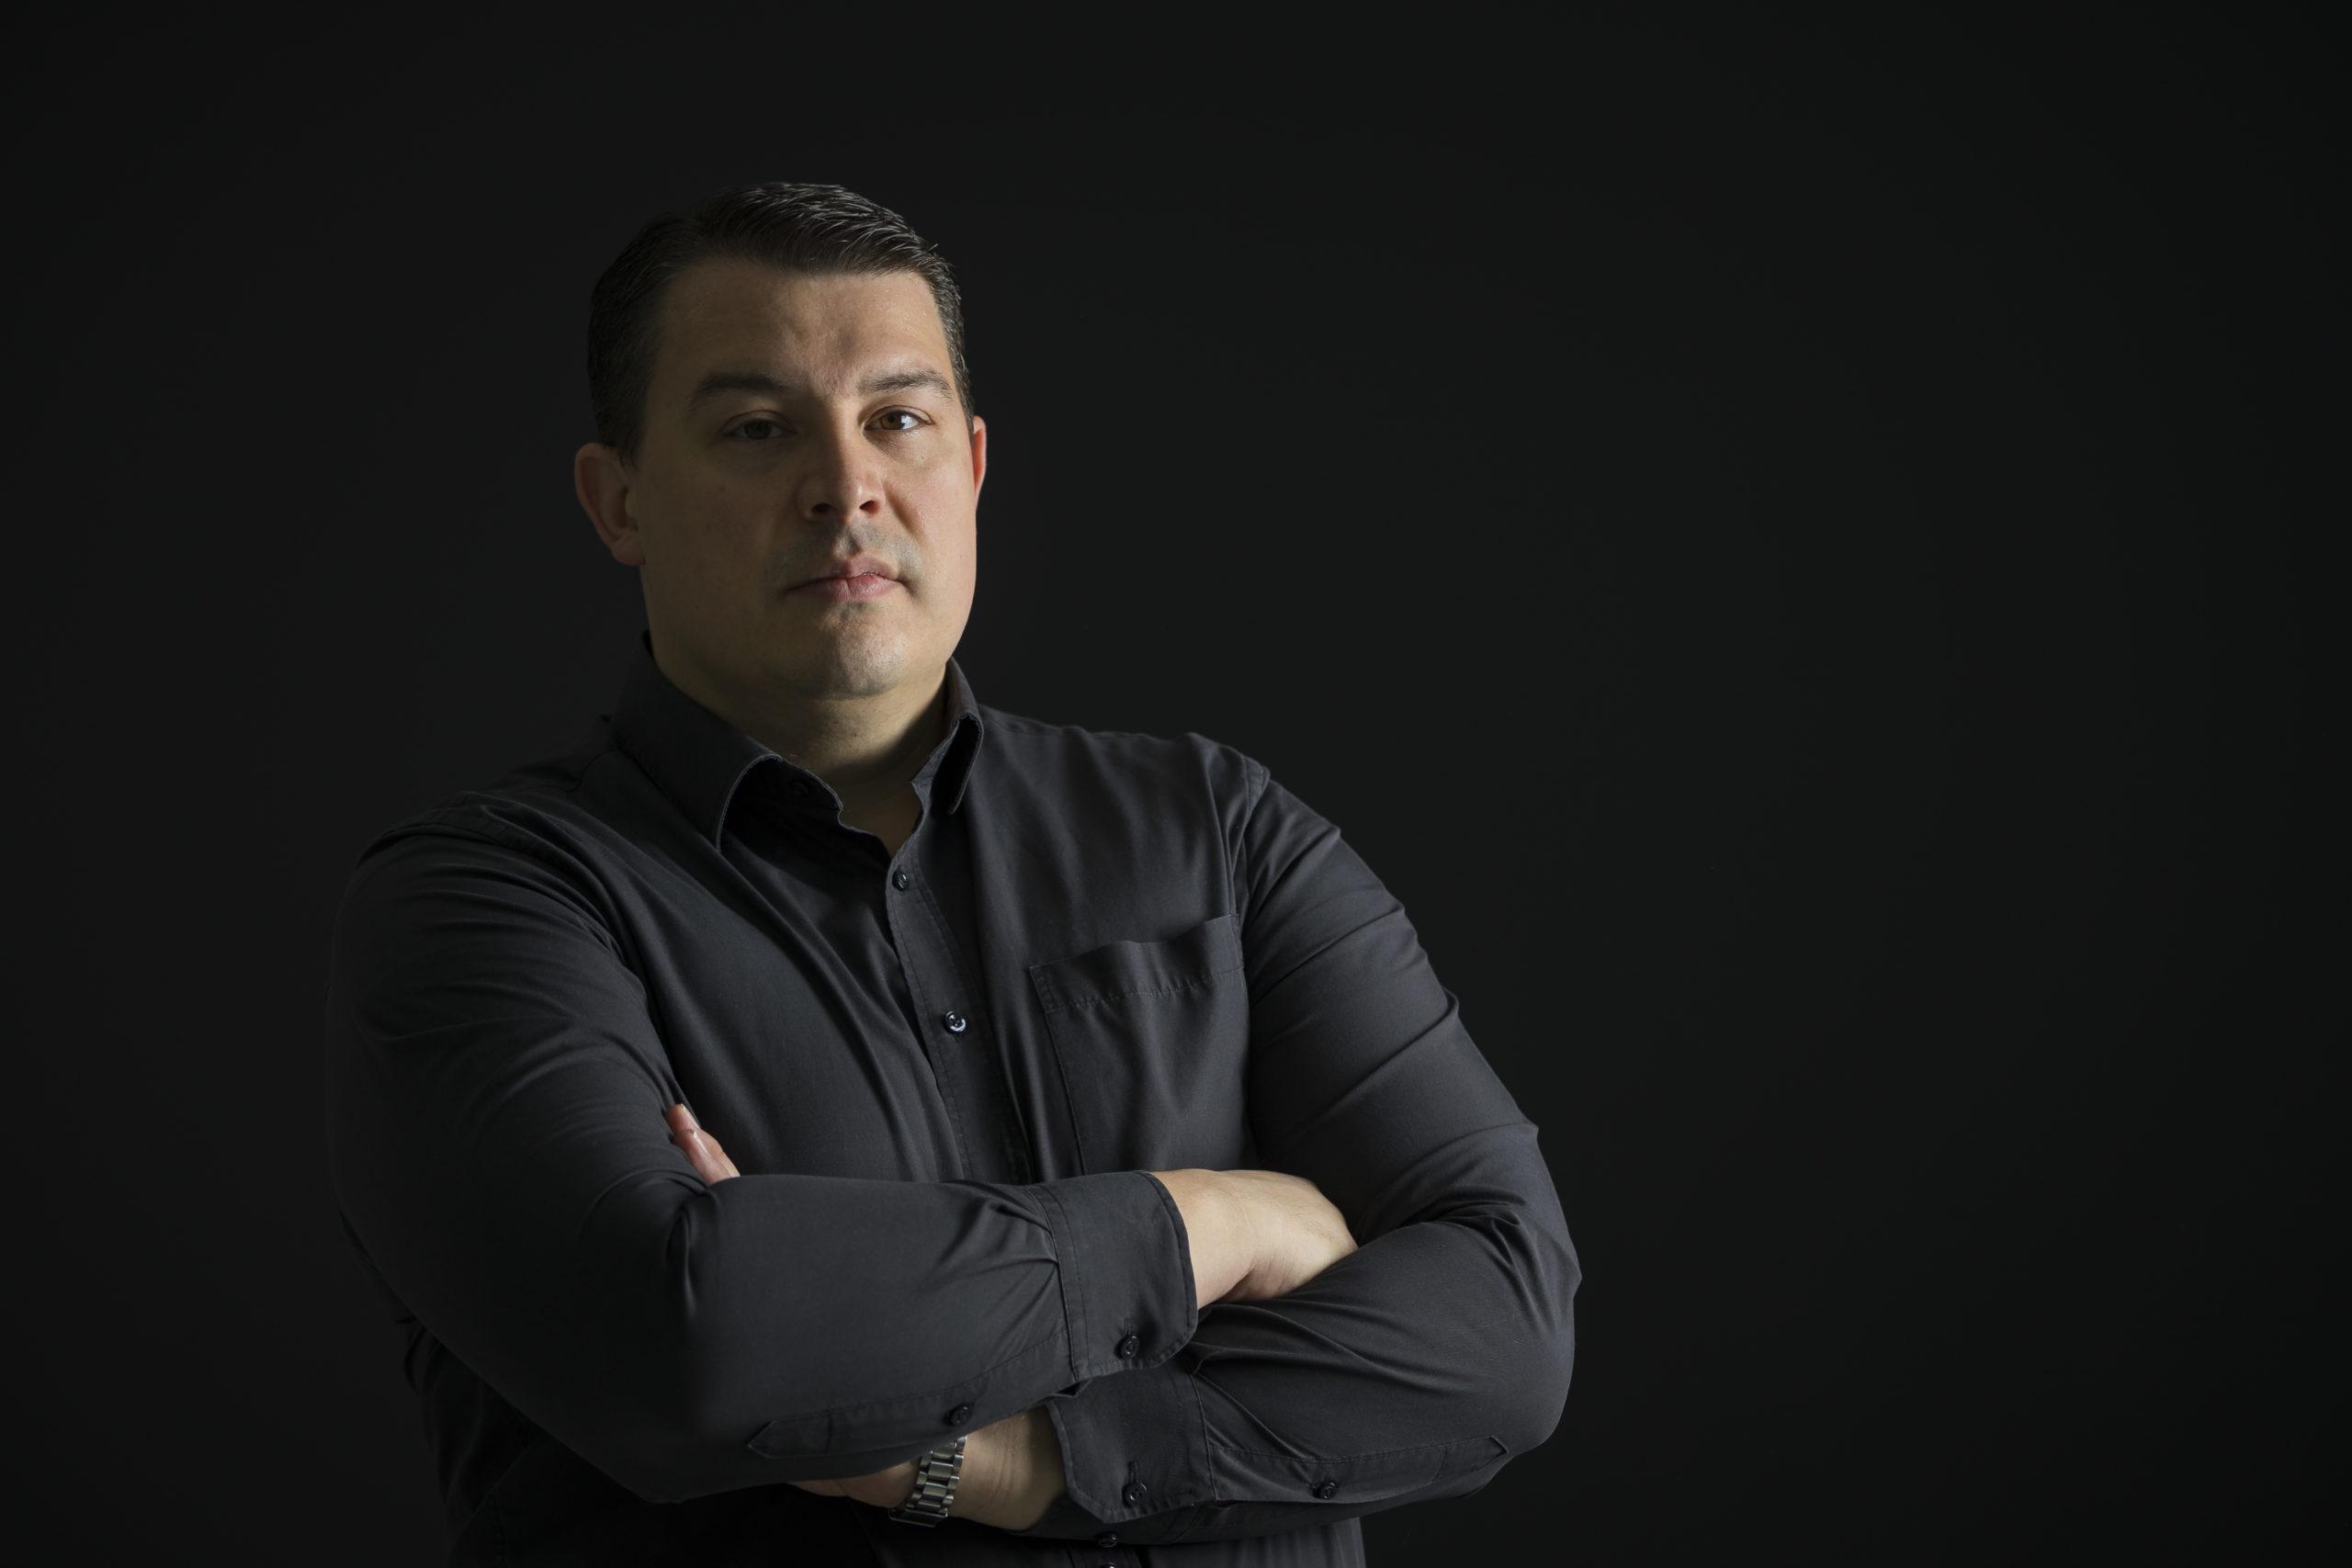 Mark Glotzbach